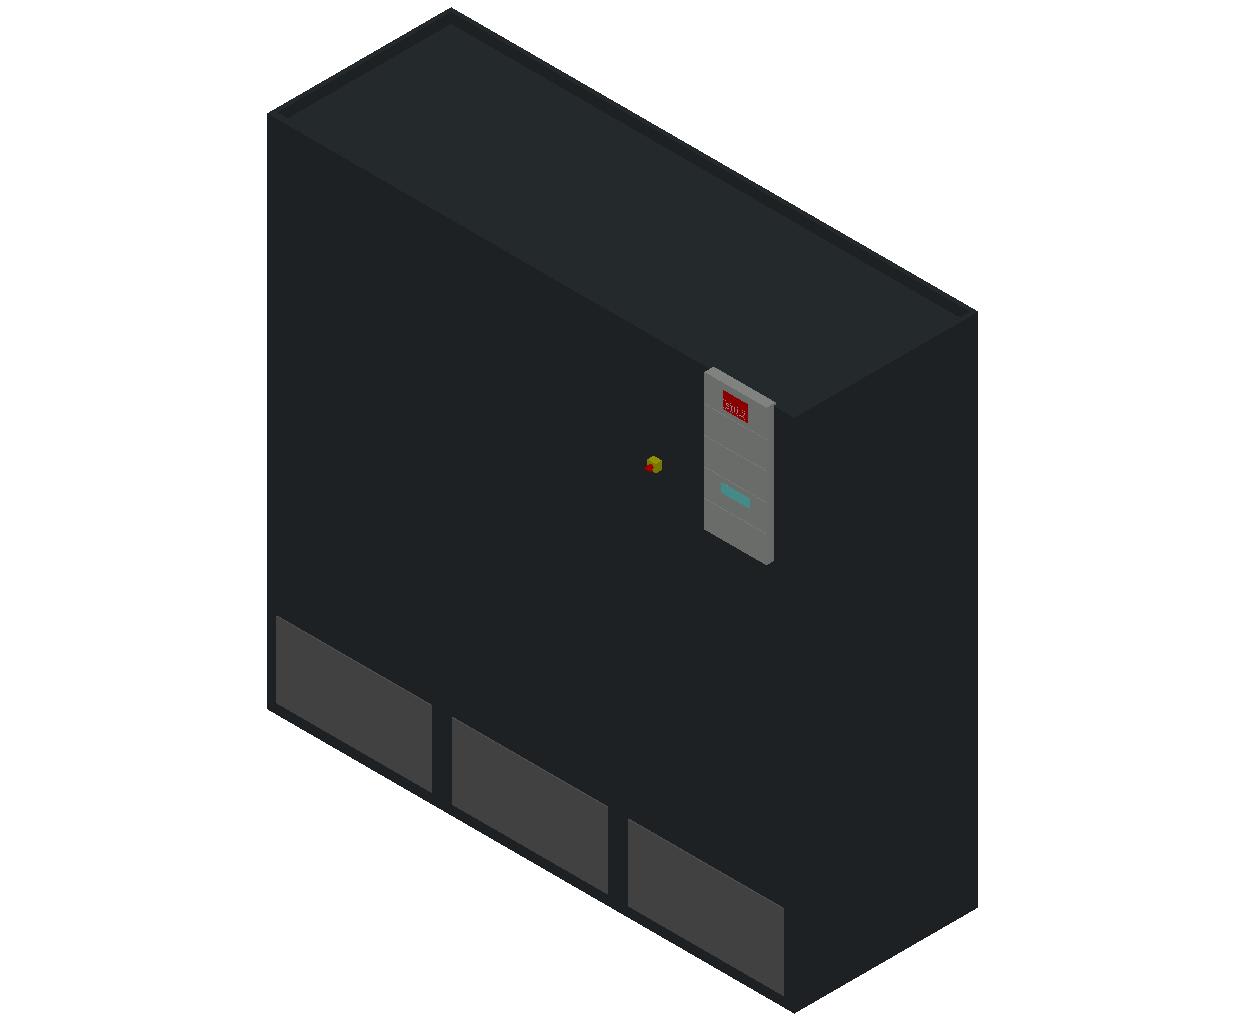 HC_Air Conditioner_Indoor Unit_MEPcontent_STULZ_CyberAir 3PRO_ALR_Dual Circuit GES_ALR_552_GES_INT-EN.dwg